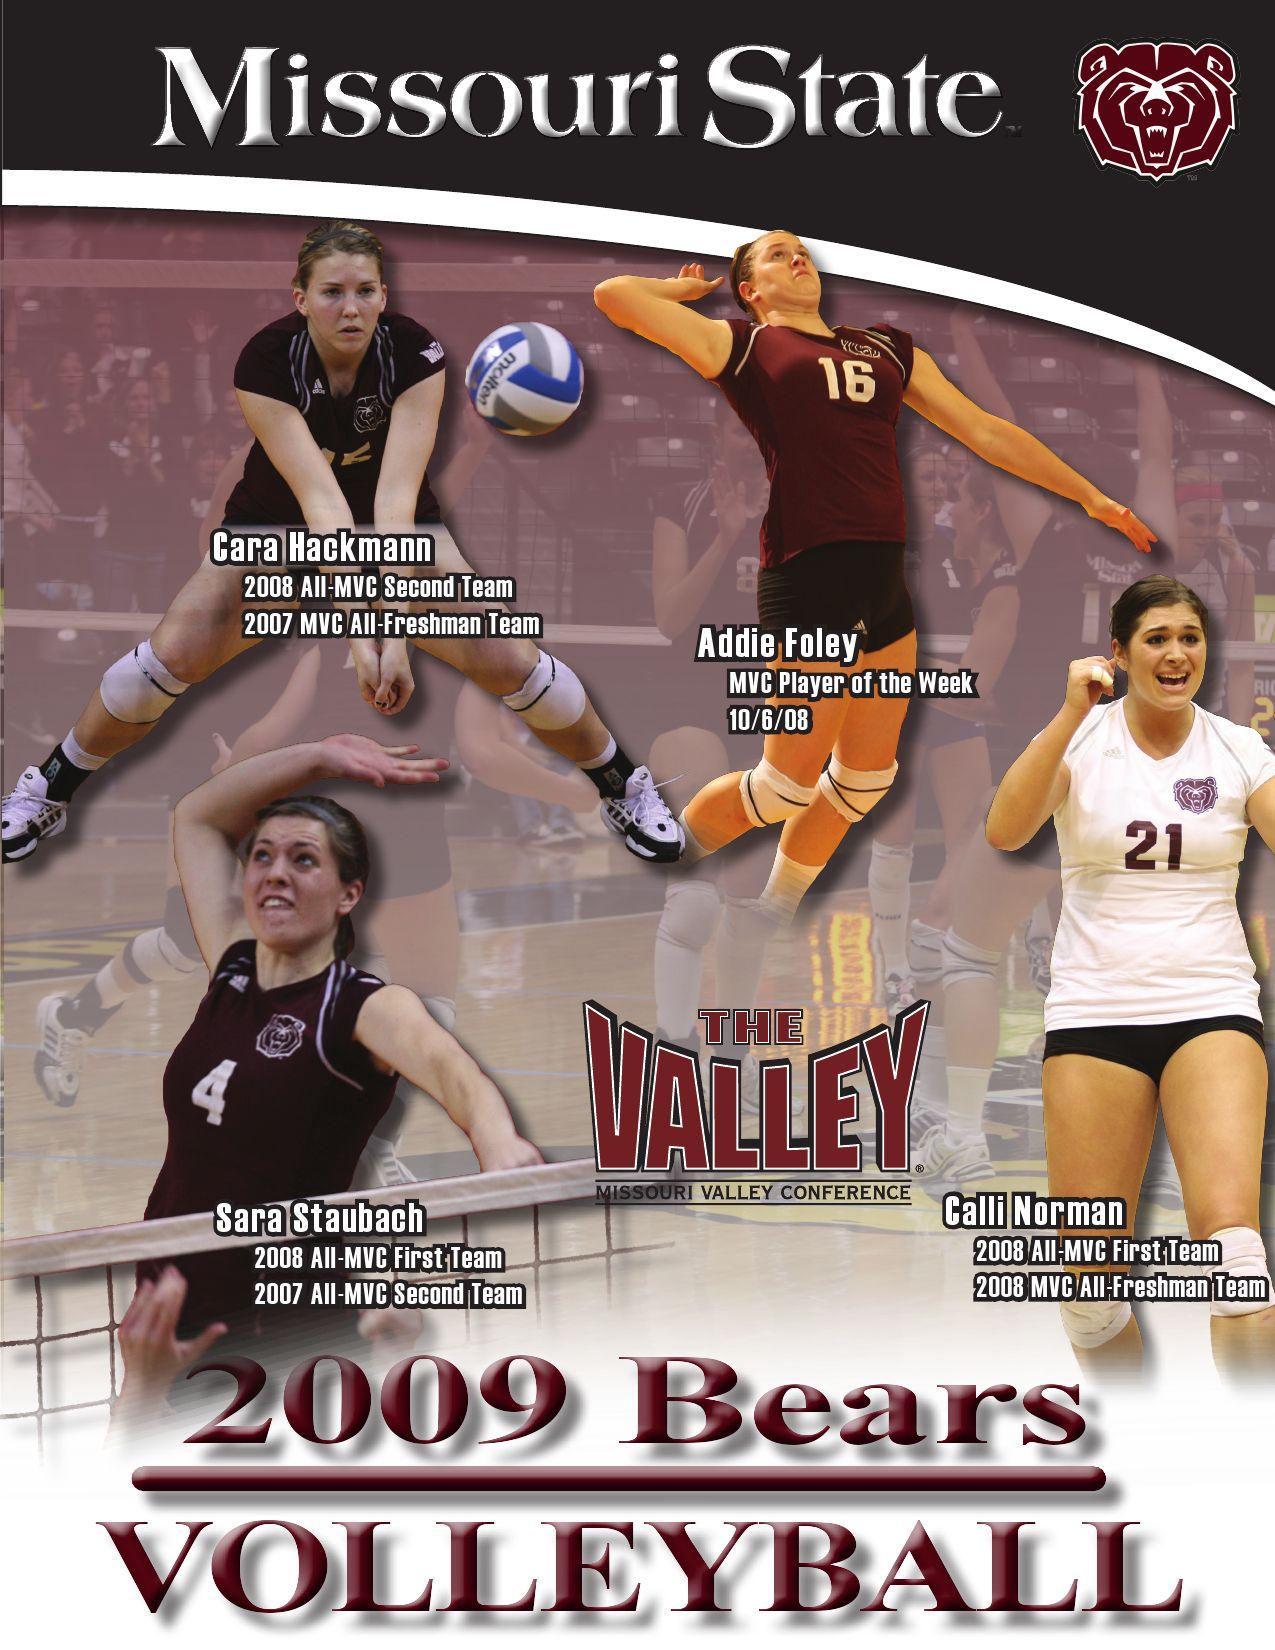 2009 MSU Volleyball Guide by Missouri State Bears - issuu